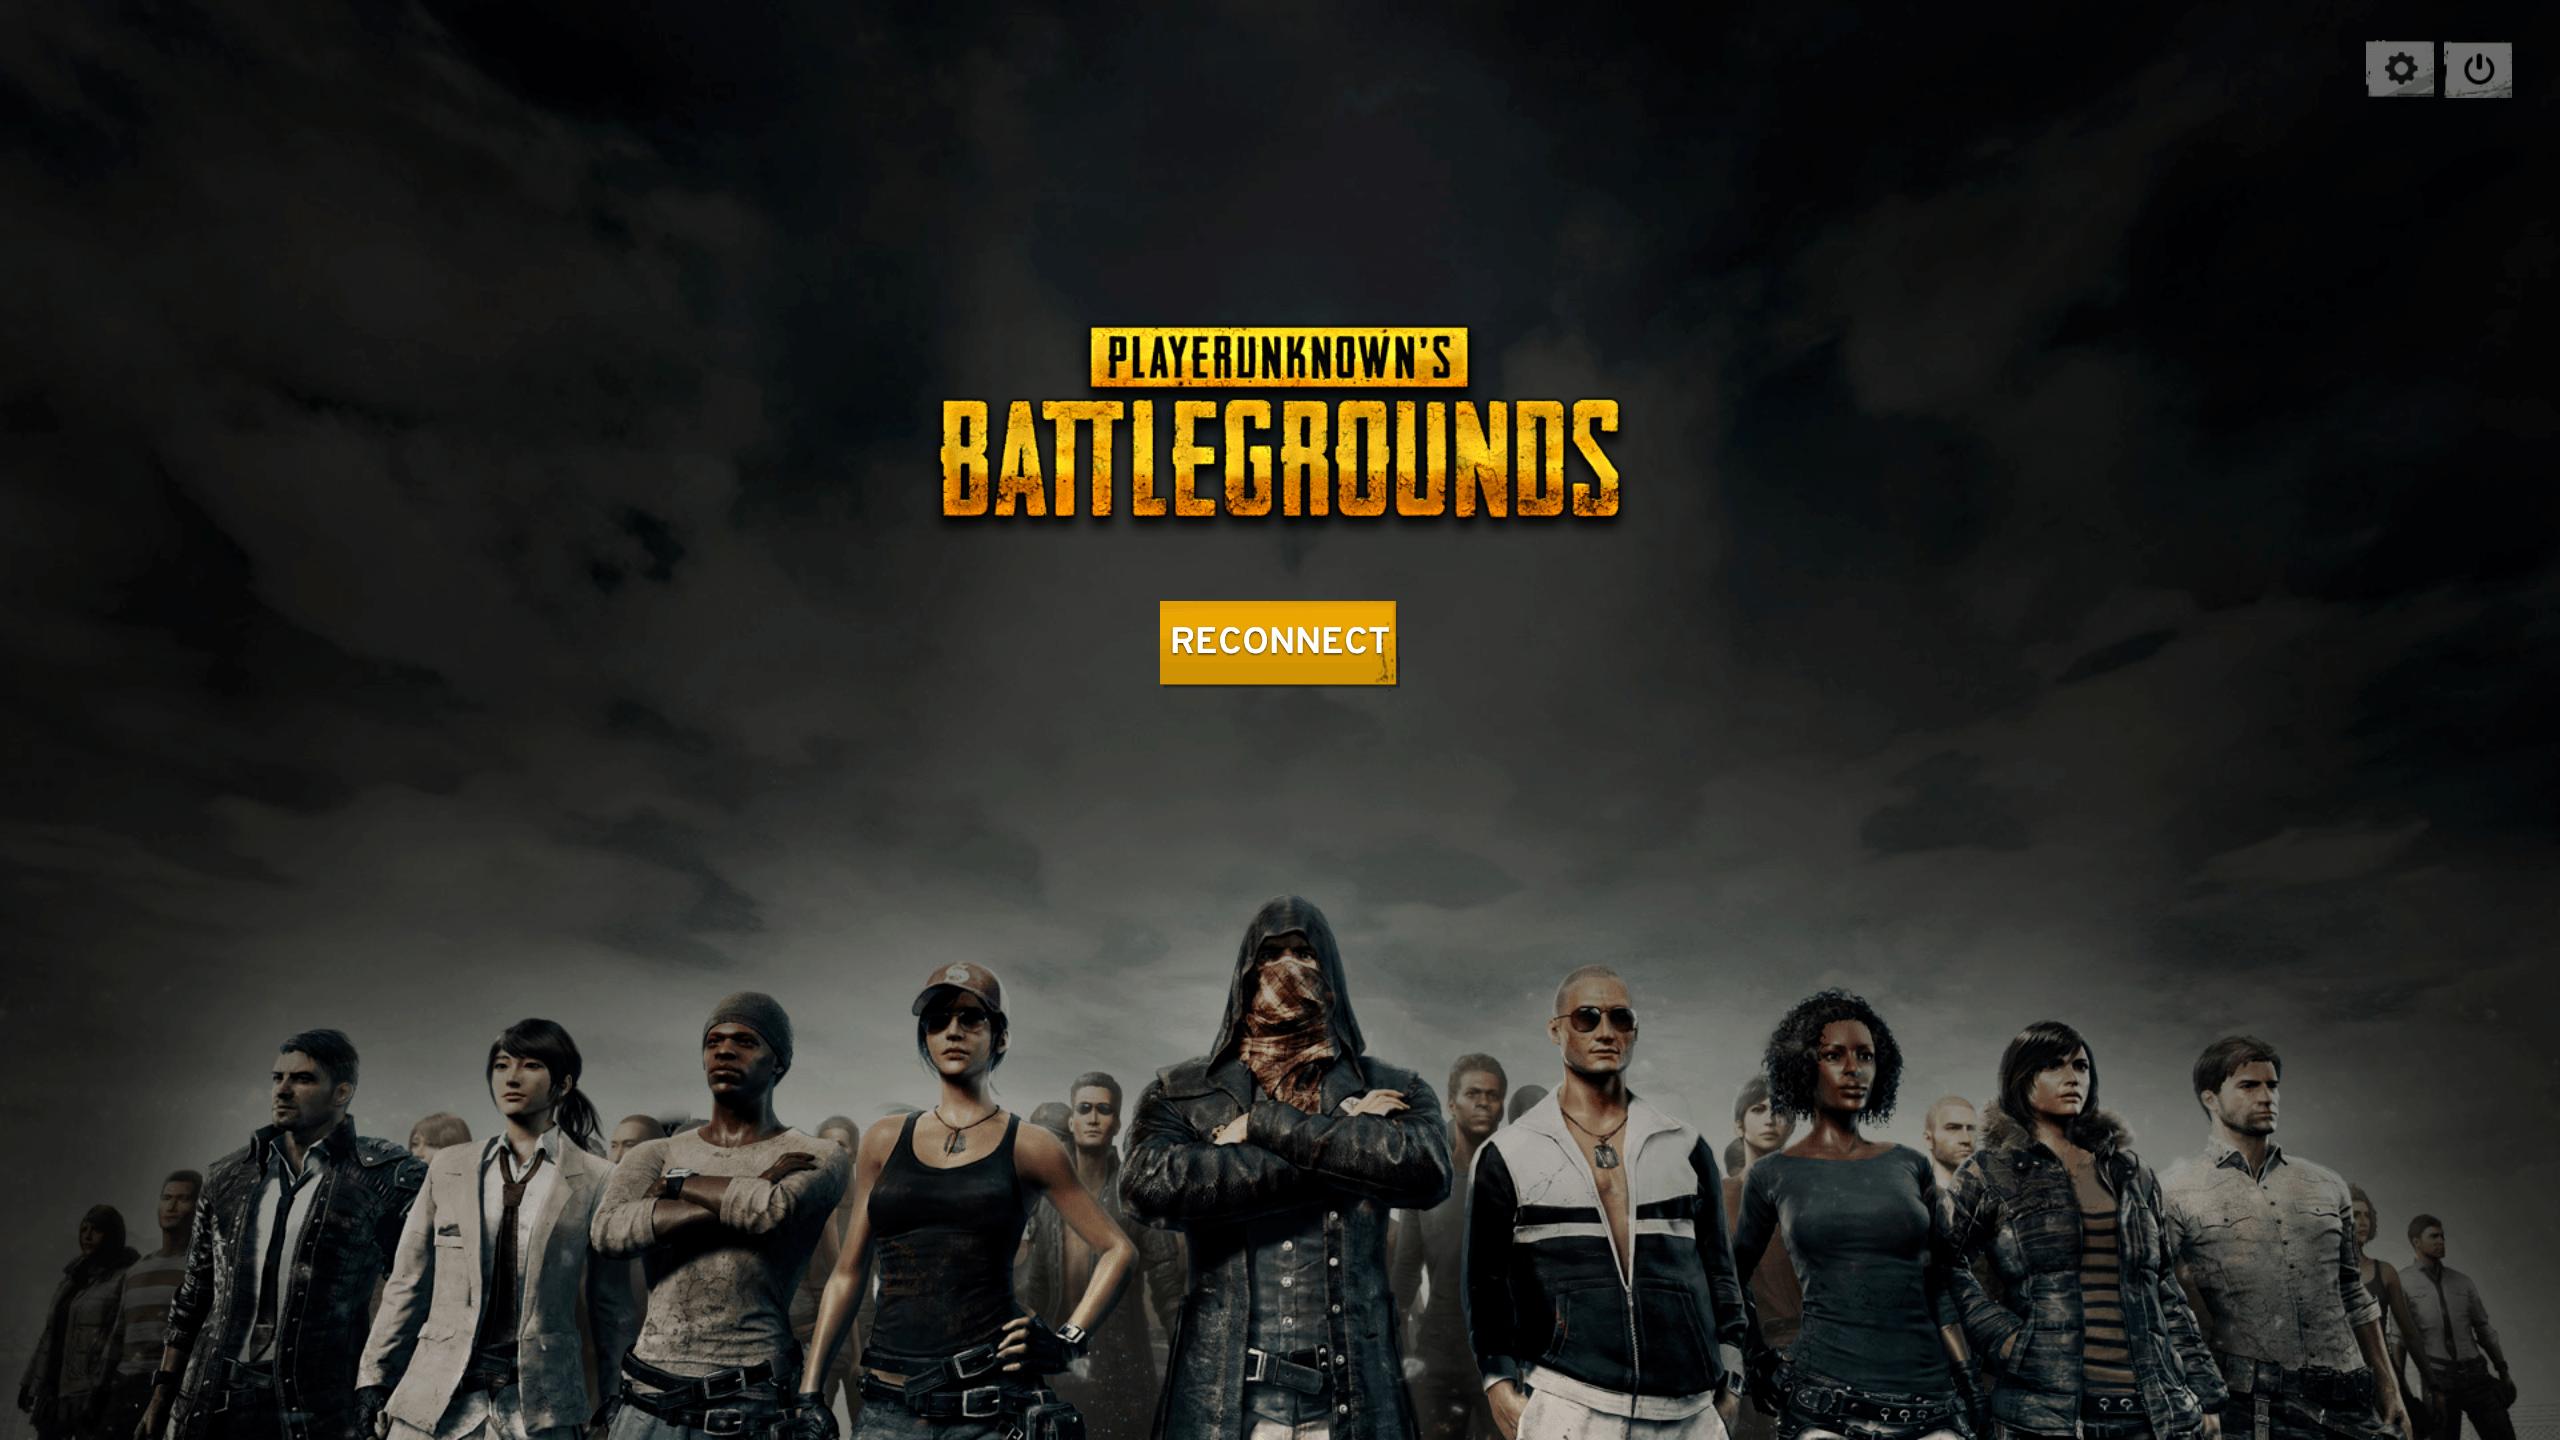 Battleground Hd Wallpapers Top Free Battleground Hd